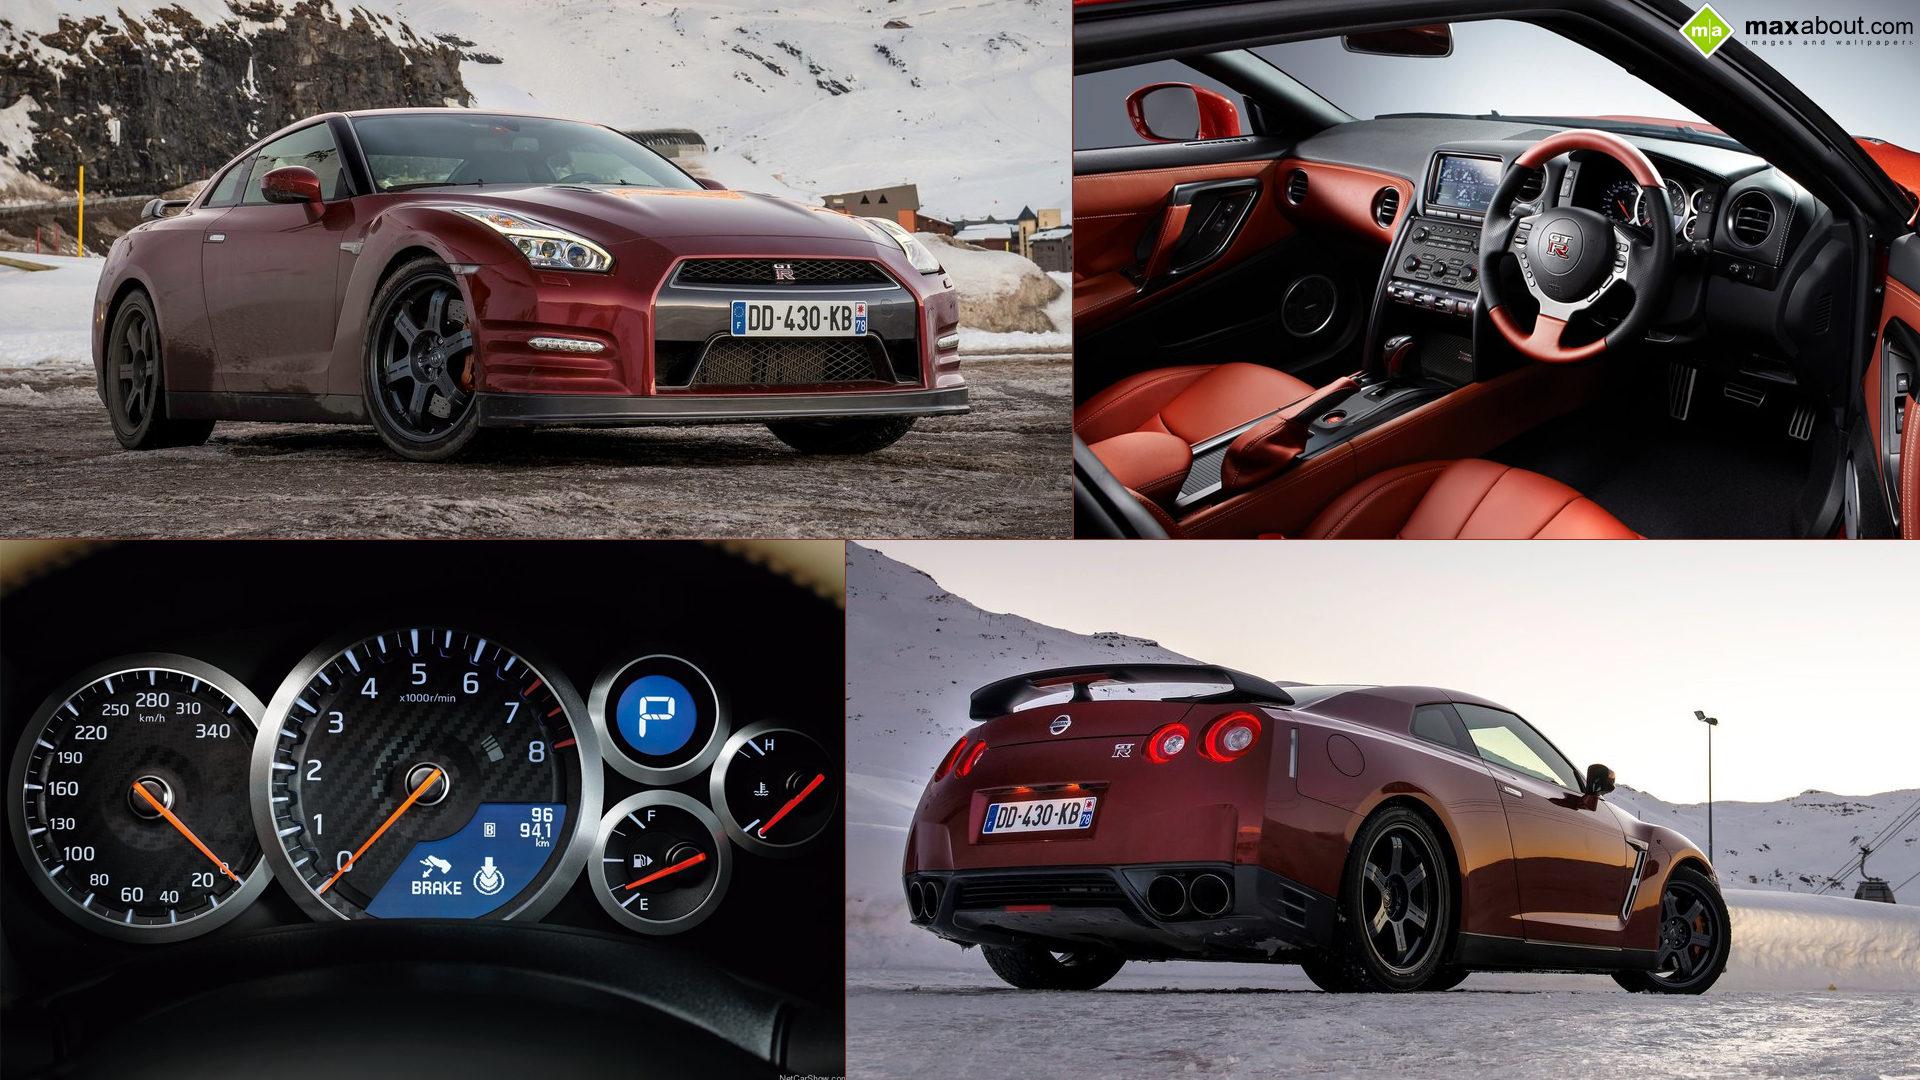 Nissan GT R Nissan Car Cars 1920x1080 1920x1080